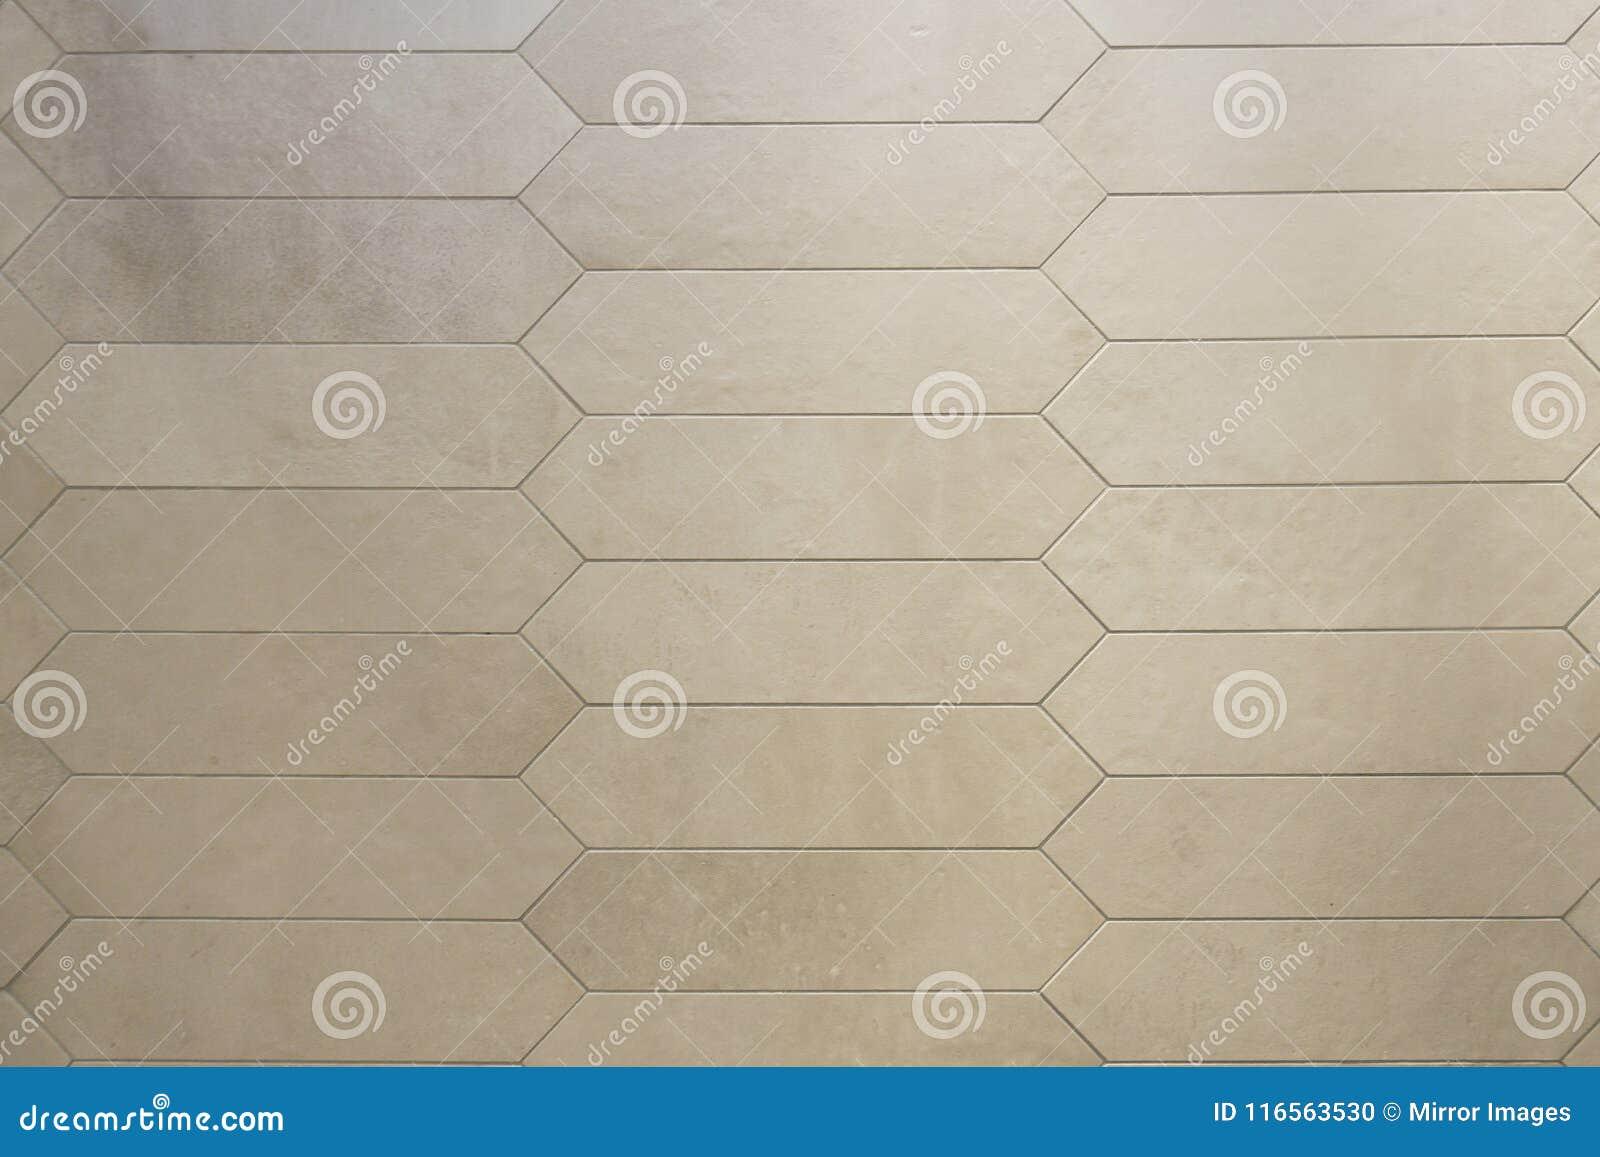 Light Tan Long 6 Pointed Tile Stock Photo - Image of metal ...